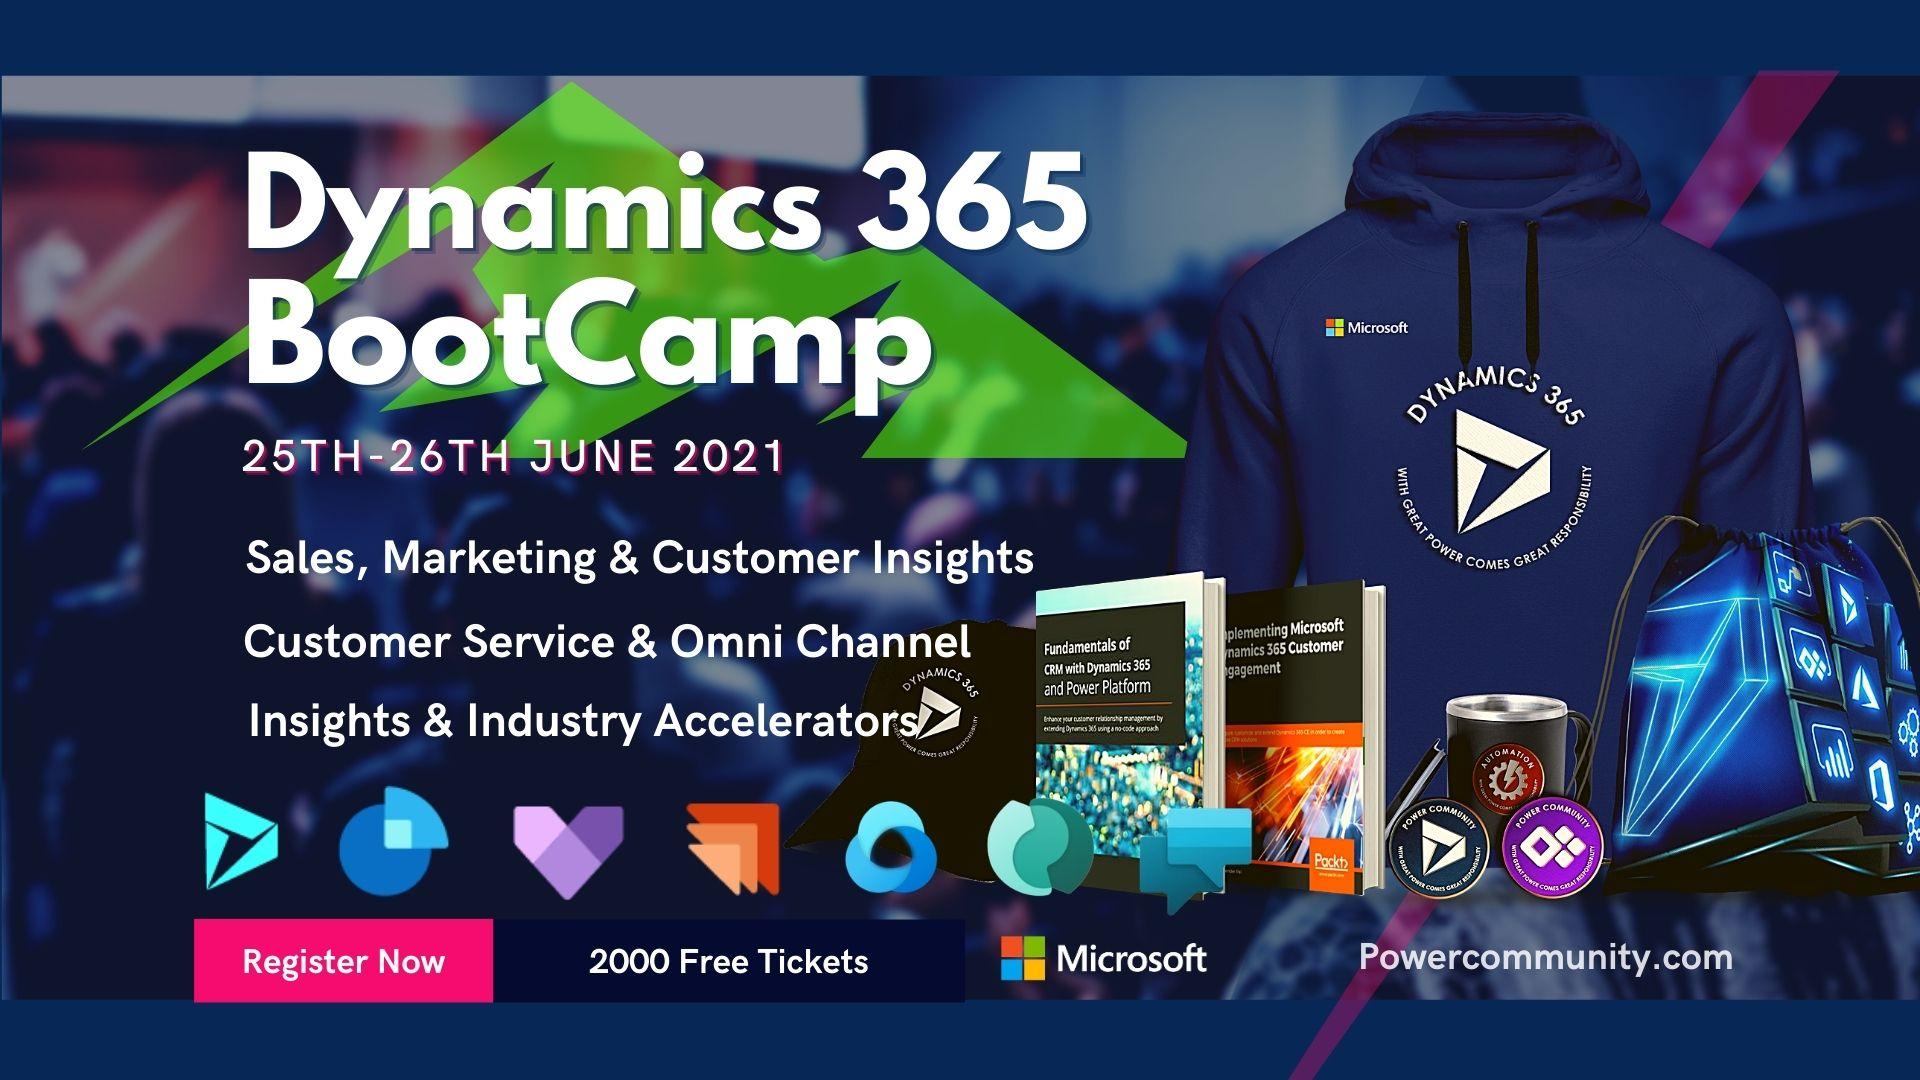 Dynamics 365 Bootcamp